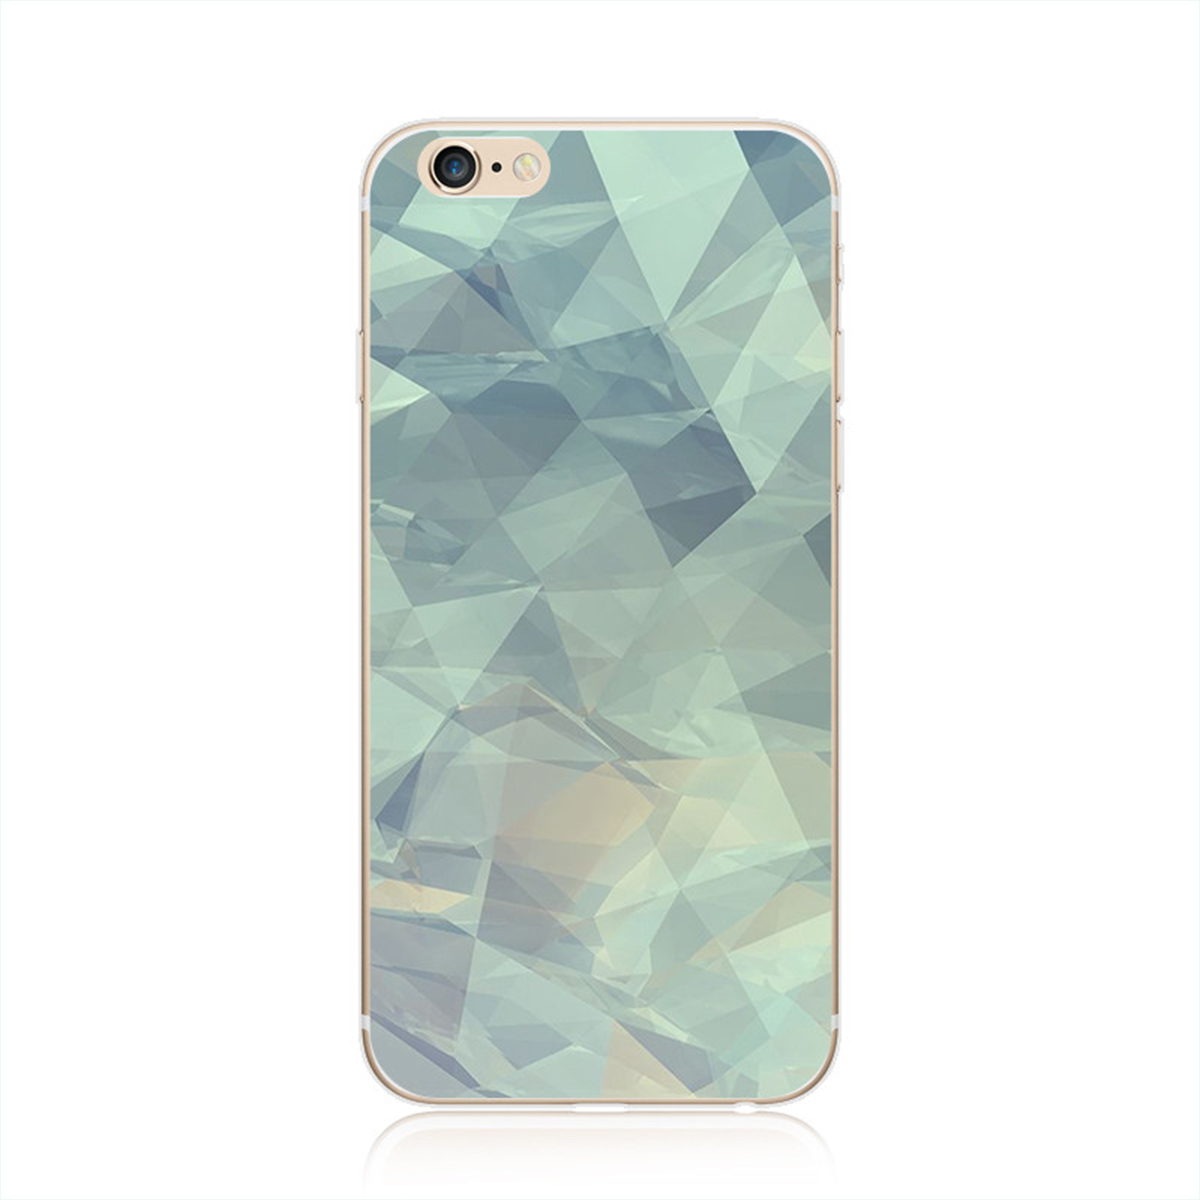 Kritzel Schutzhülle für iPhone 7 - Abstract